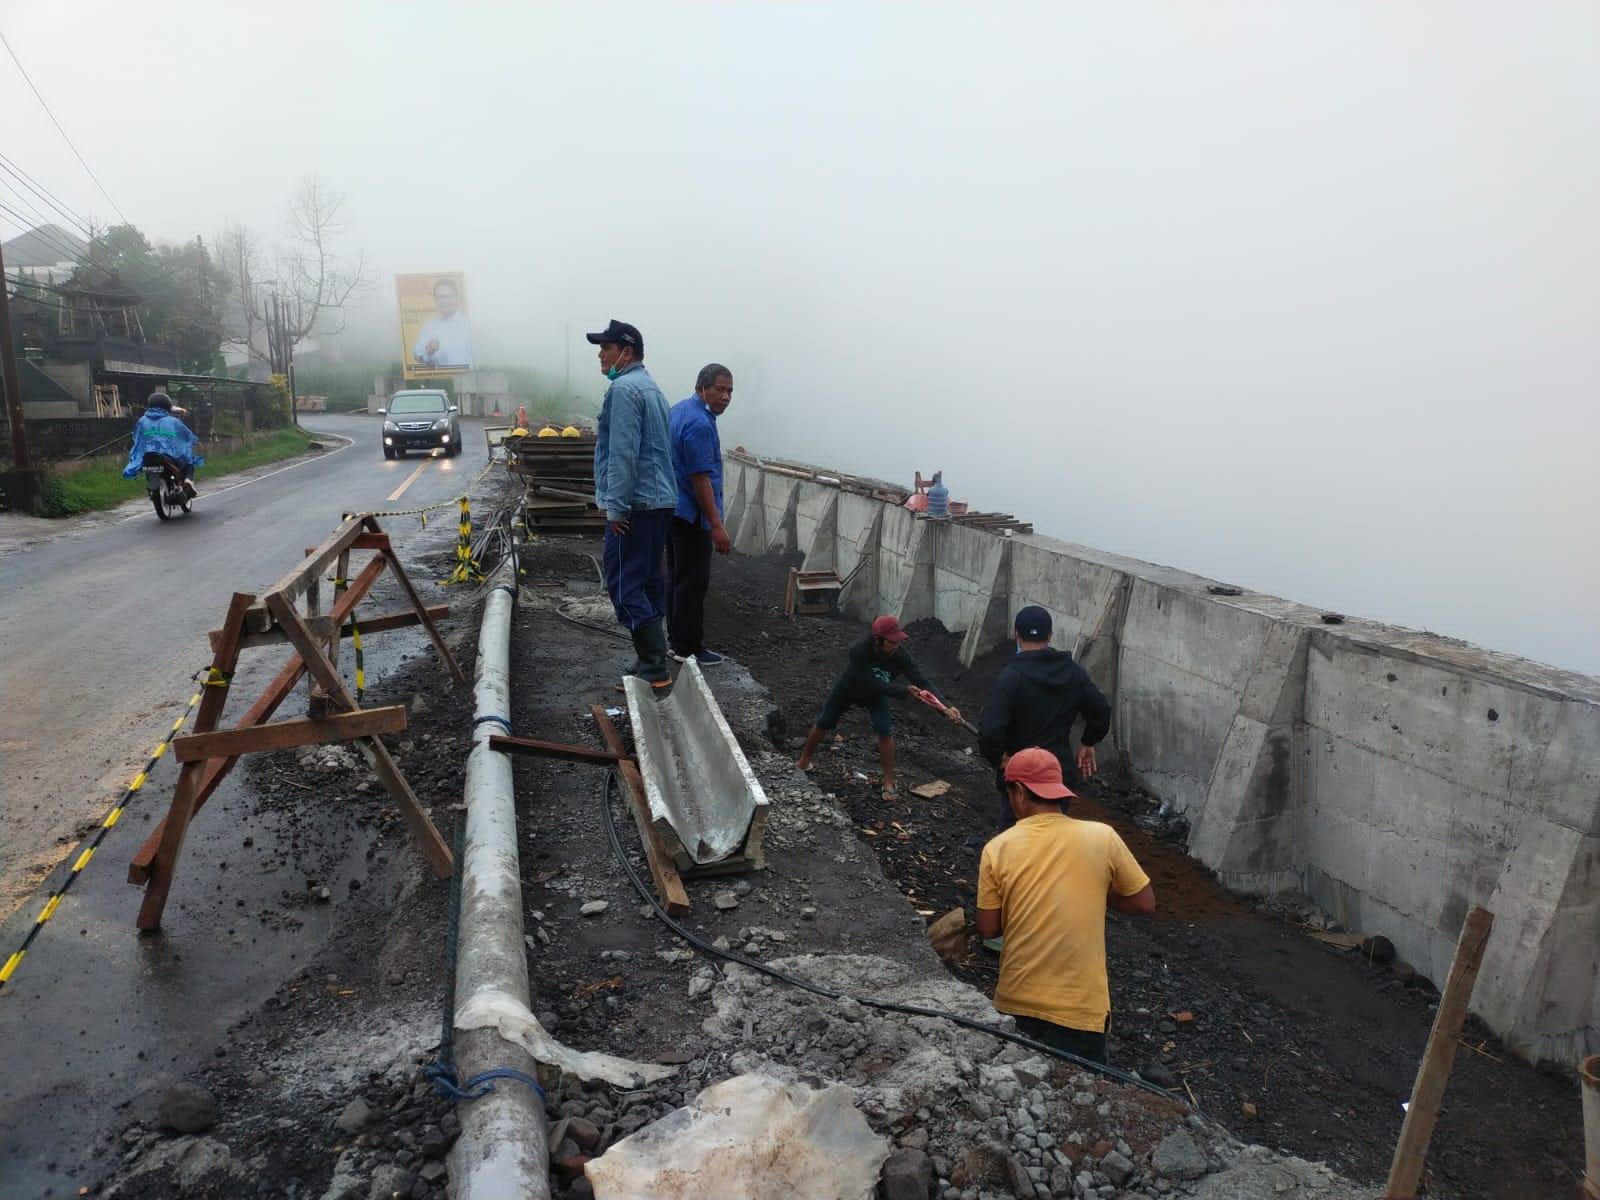 SALAH satu upaya pelayanan dari Perimda TAB Tabanan adalah perbaikan fasilitas pipa air, agar air bersih terus mengalir ke para pelanggan. Foto: ist